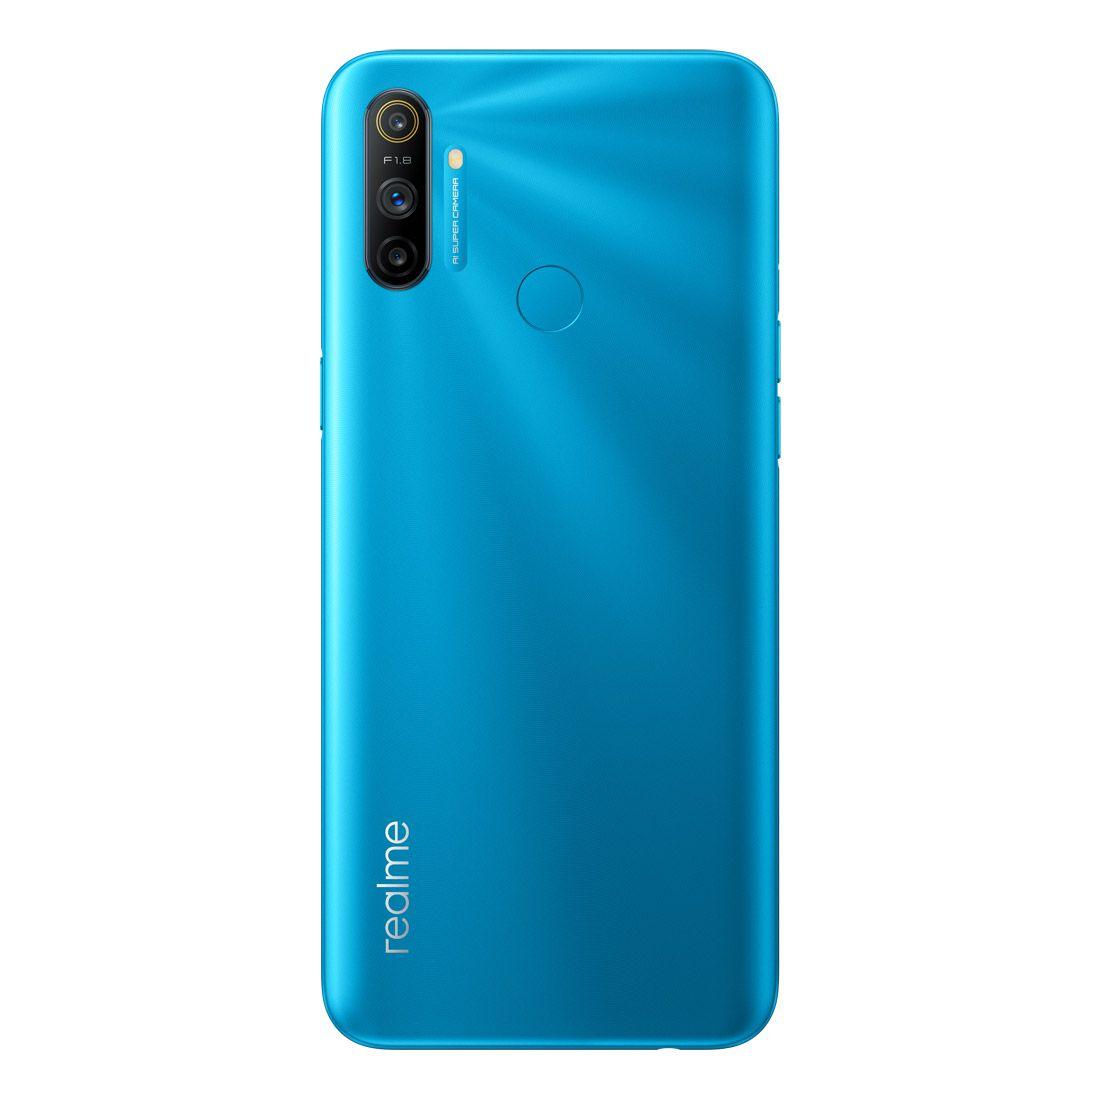 Realme C3 3/32Gb BLUE - 4